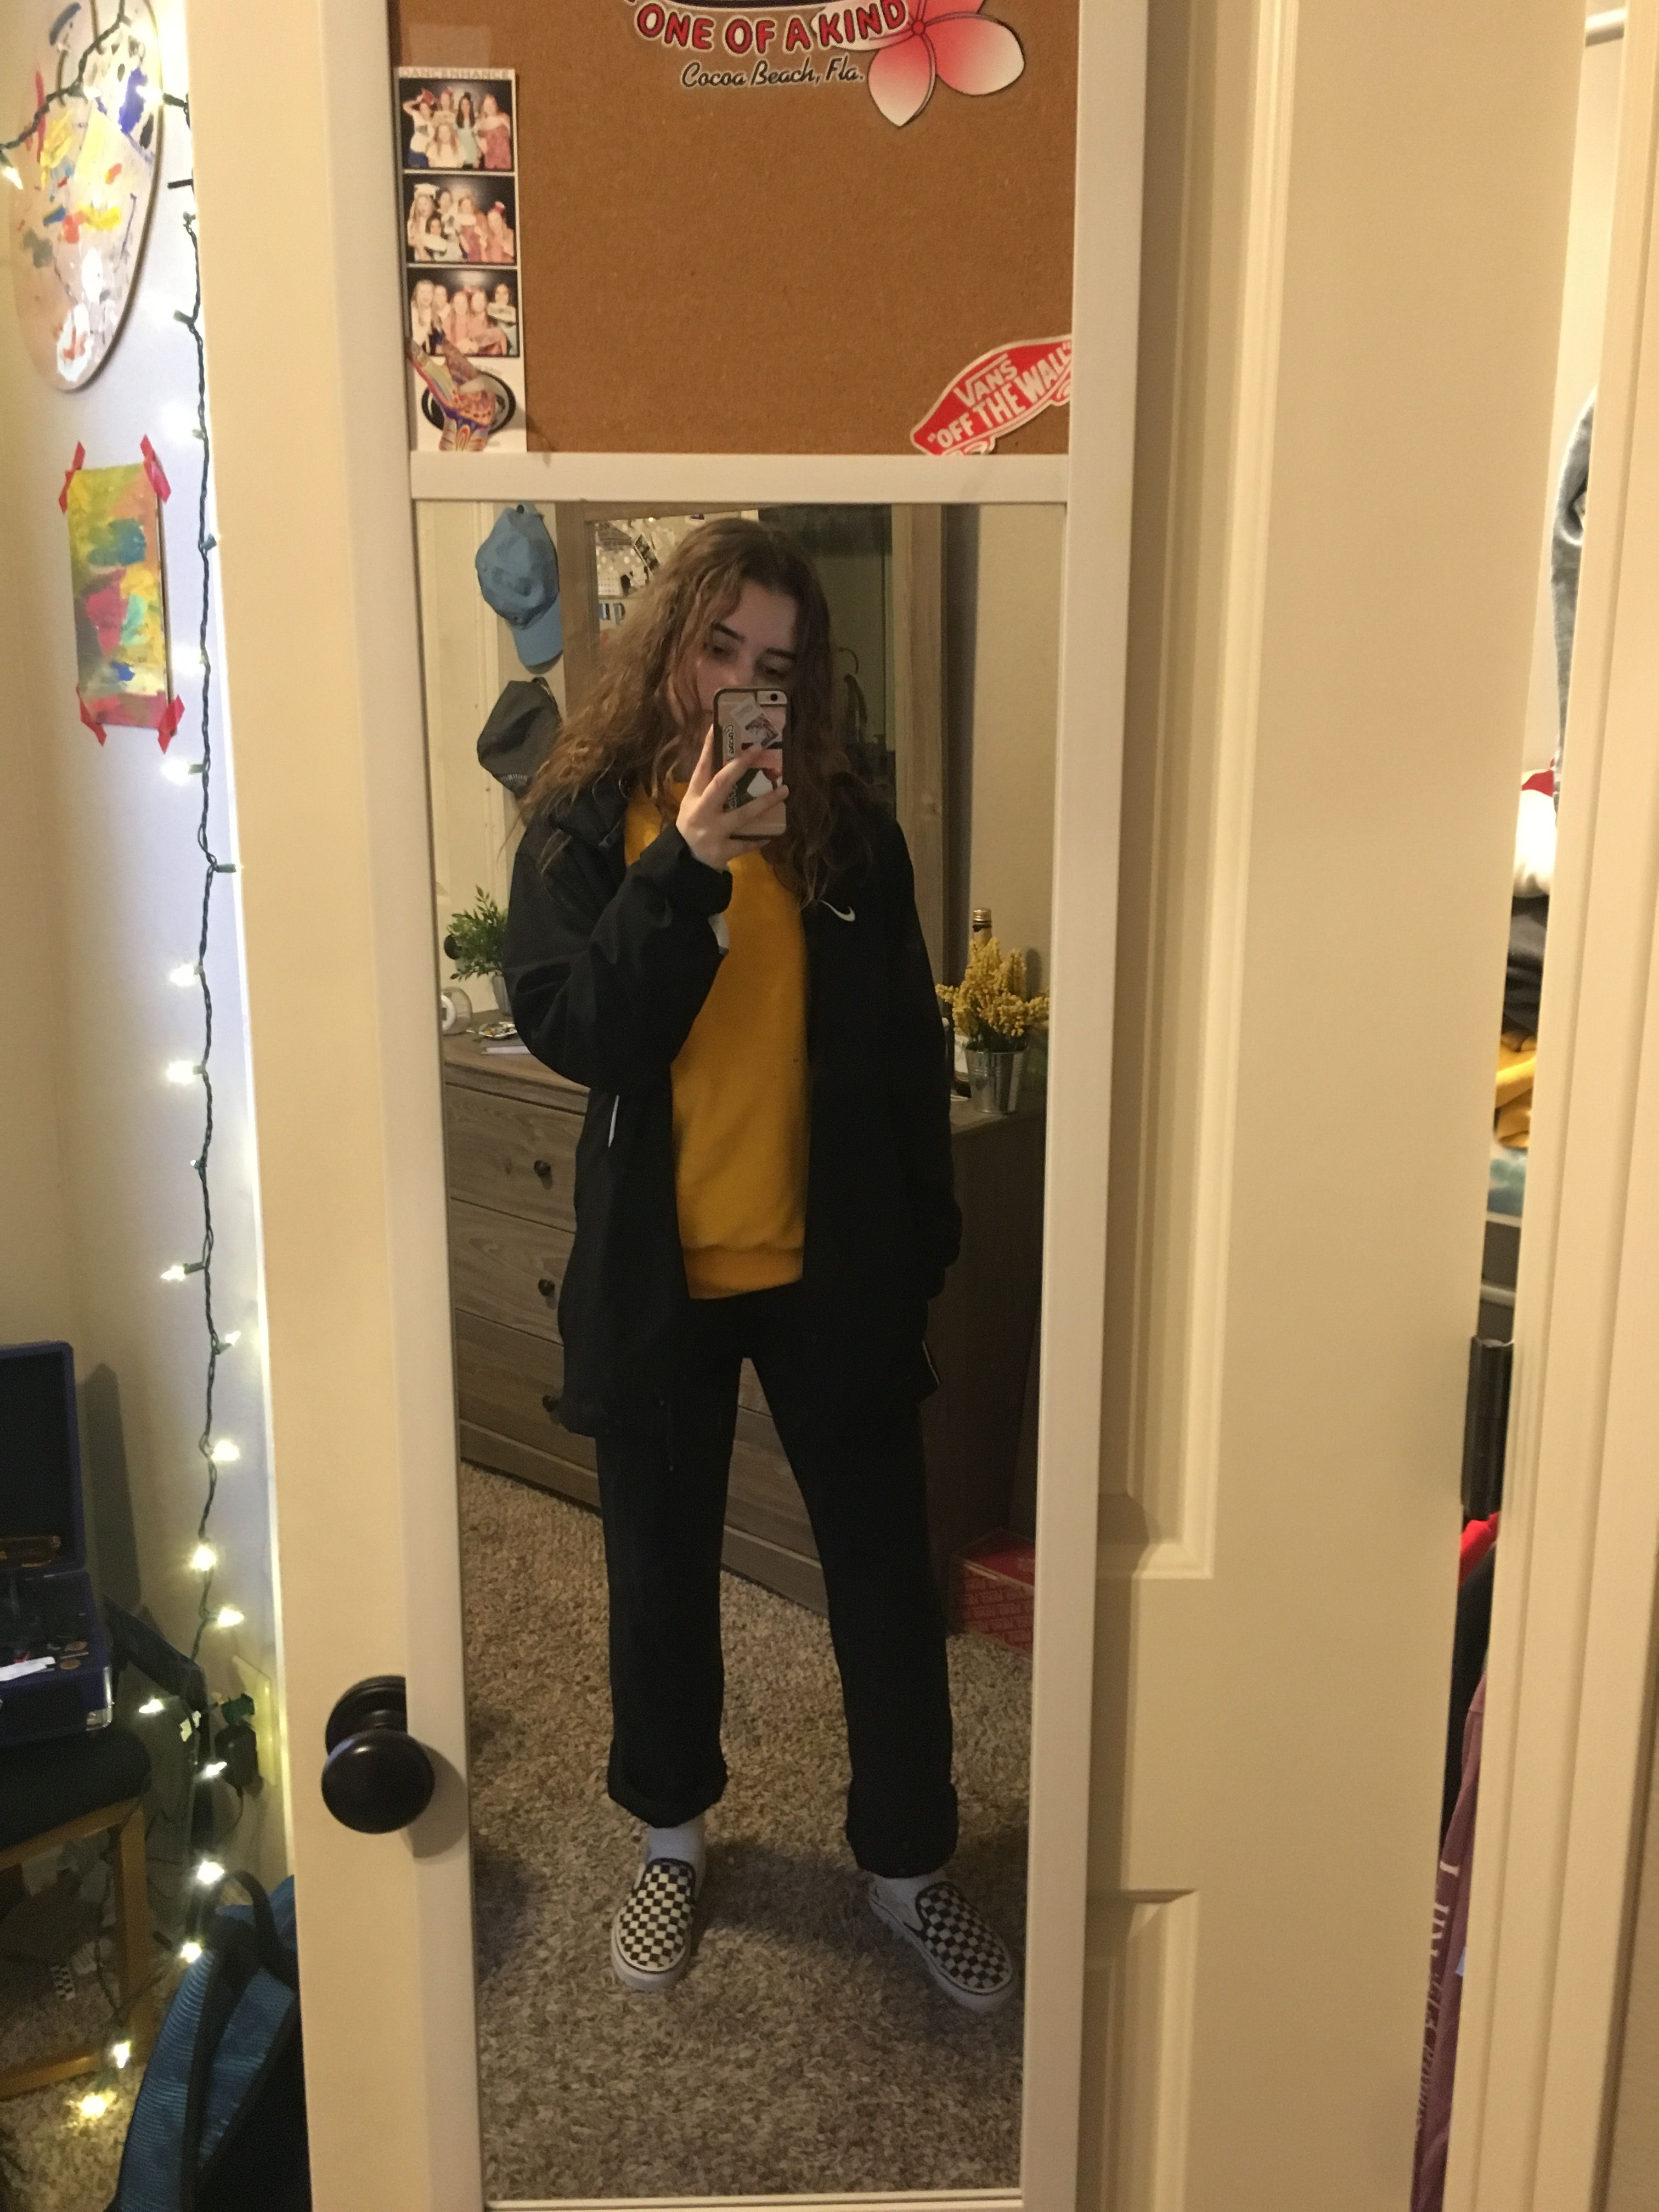 Black Nike Windbreaker Champion Yellow Sweatshirt Nike Sweatpants Black And White Checkered Vans Black Nikes White Checkered Vans Yellow Sweatshirt [ 4032 x 3024 Pixel ]